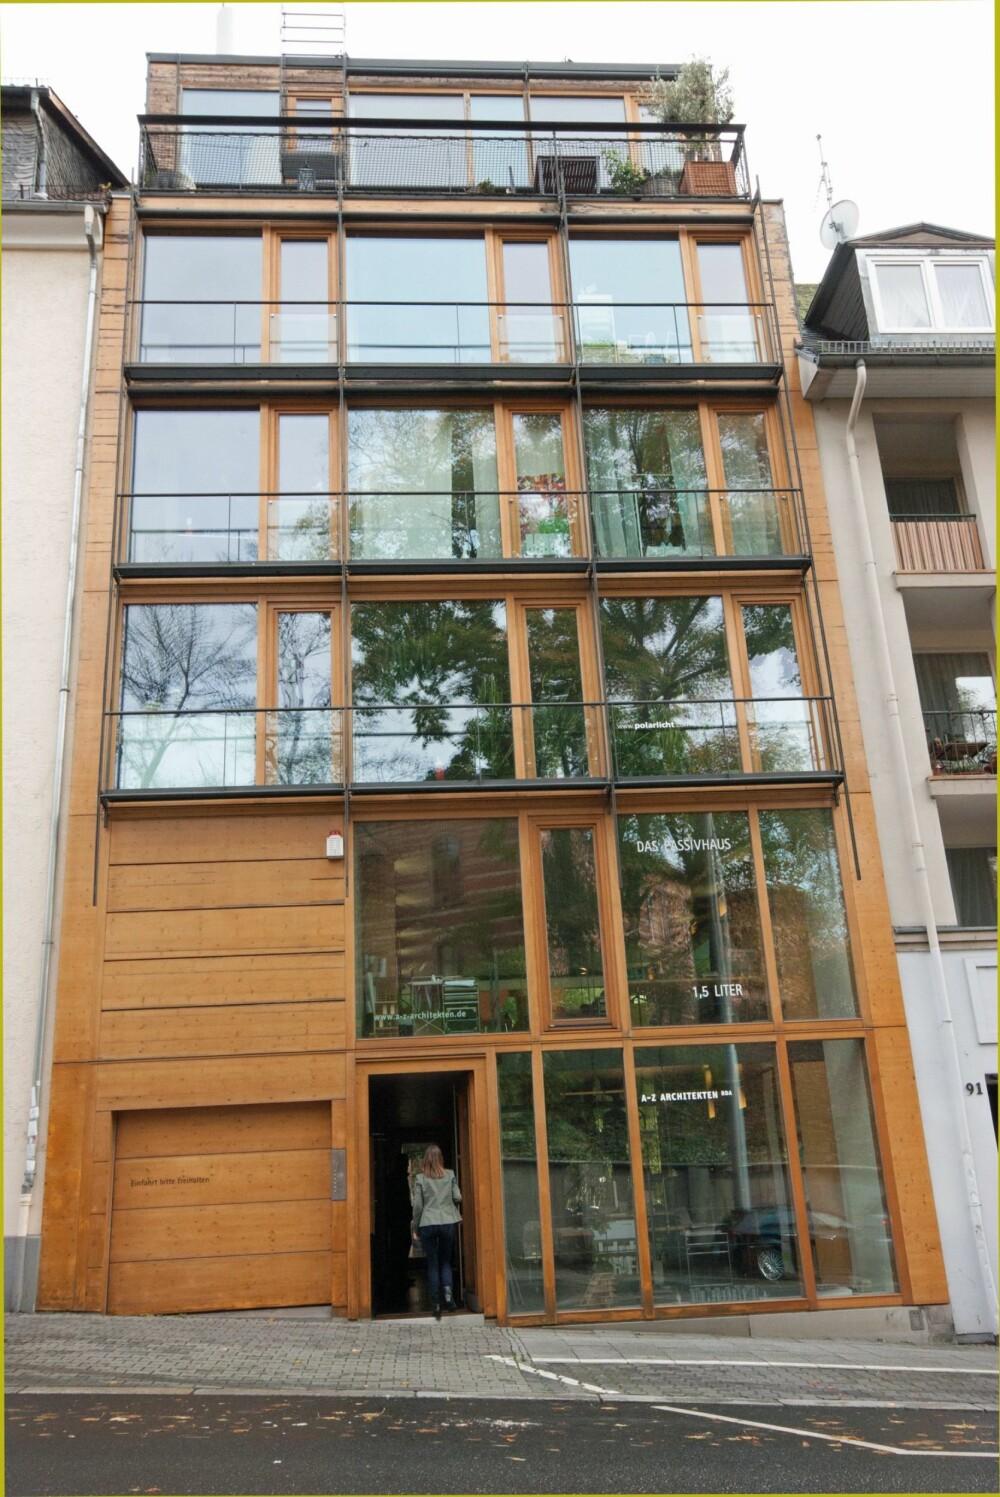 KONTORBYGG SOM PASSIVHUS: Dette er det første kontorbygget i passivhusstandard i Tyskland som både er kontor- og bolighus.